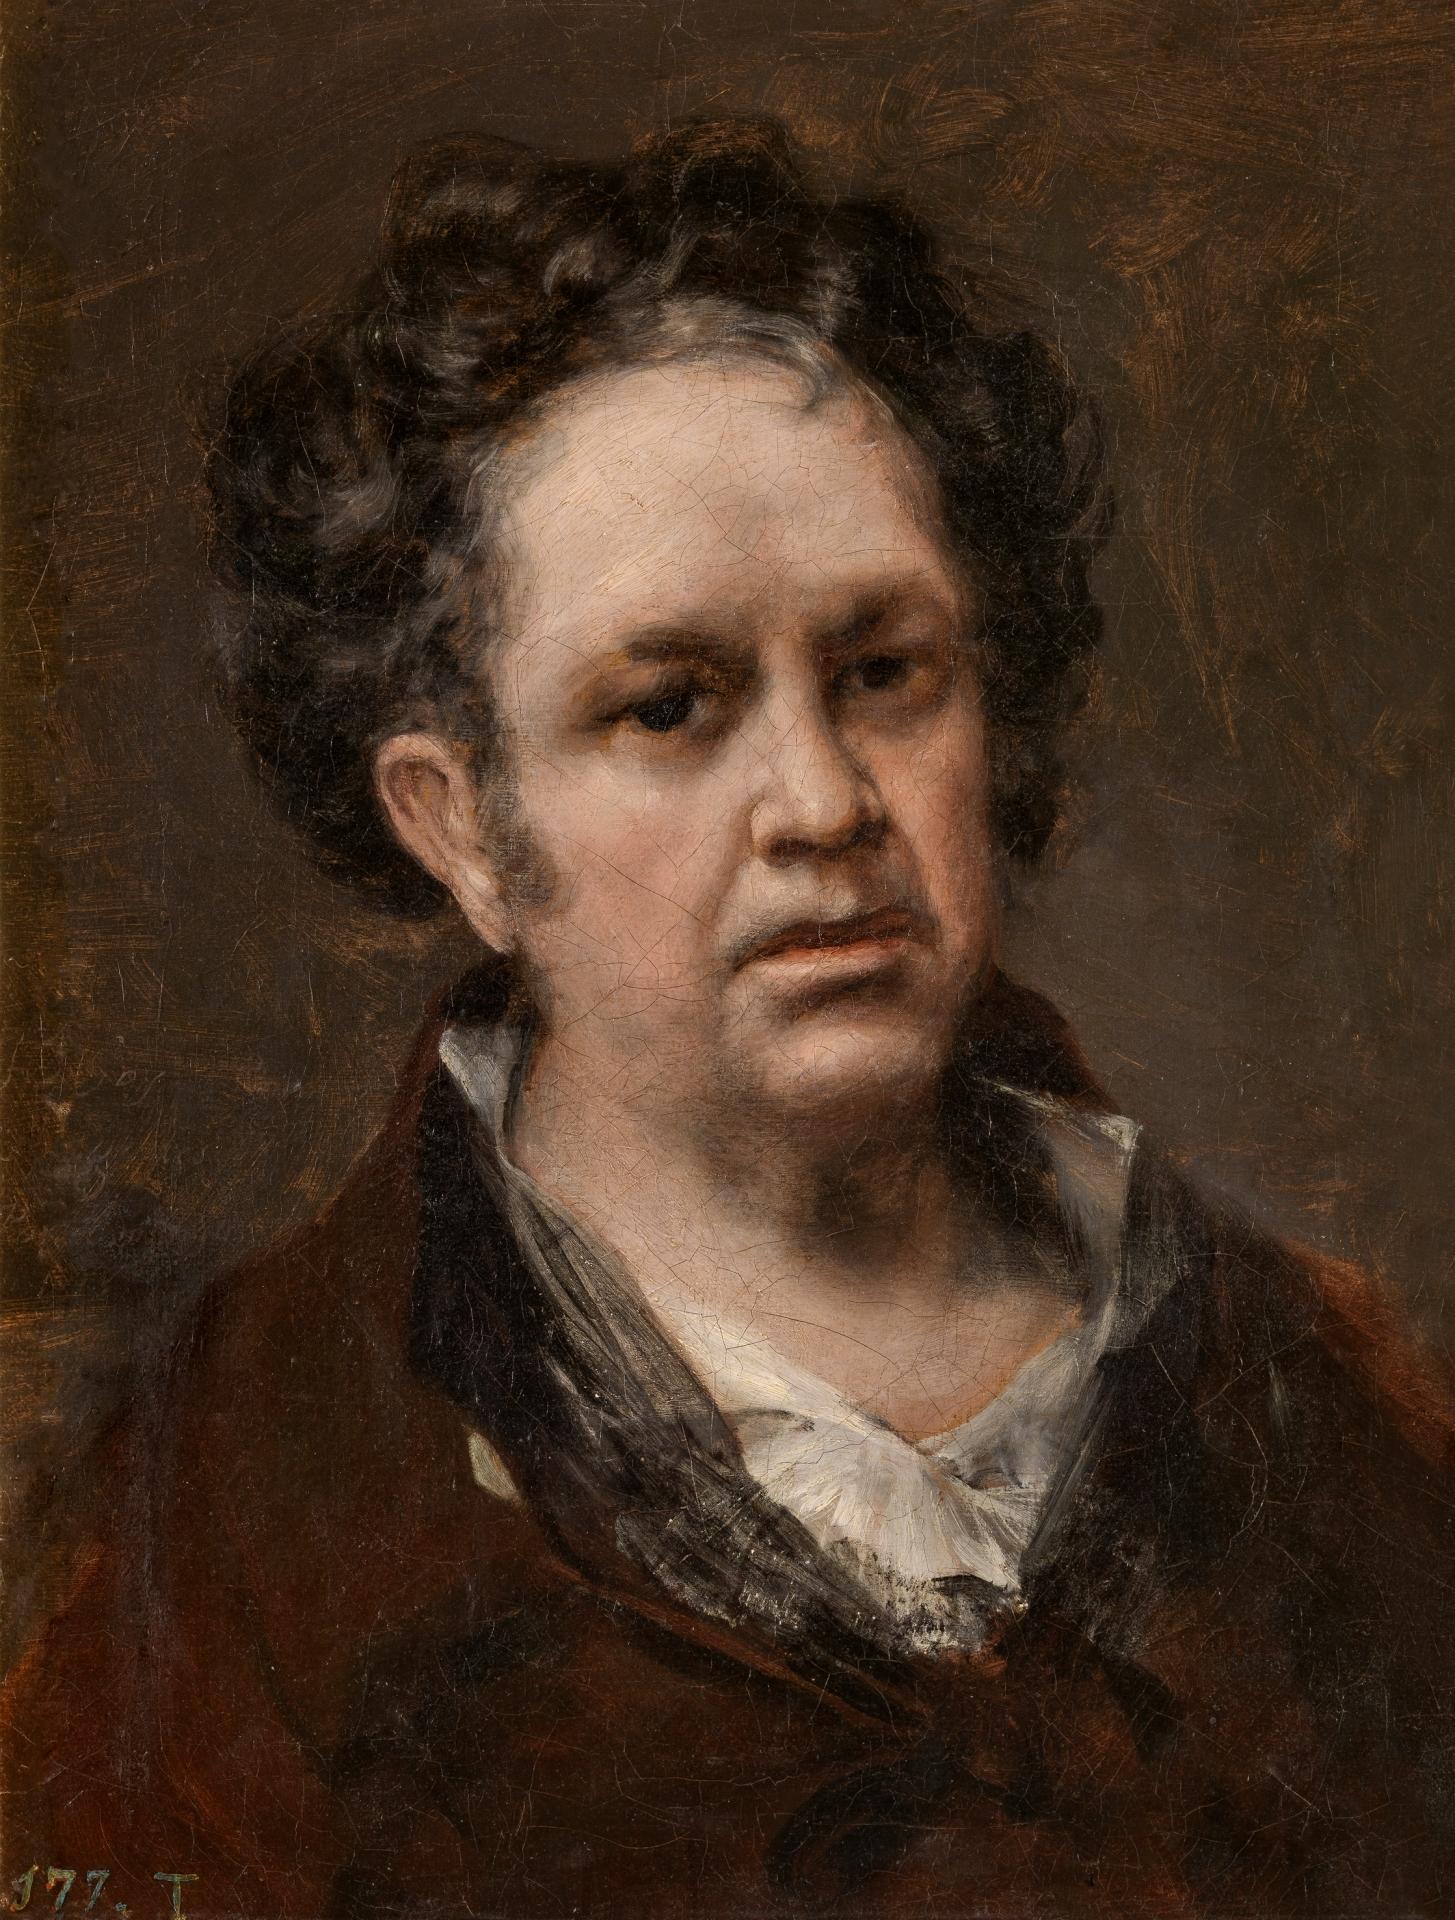 d275191d63a1 Self-Portrait - The Collection - Museo Nacional del Prado